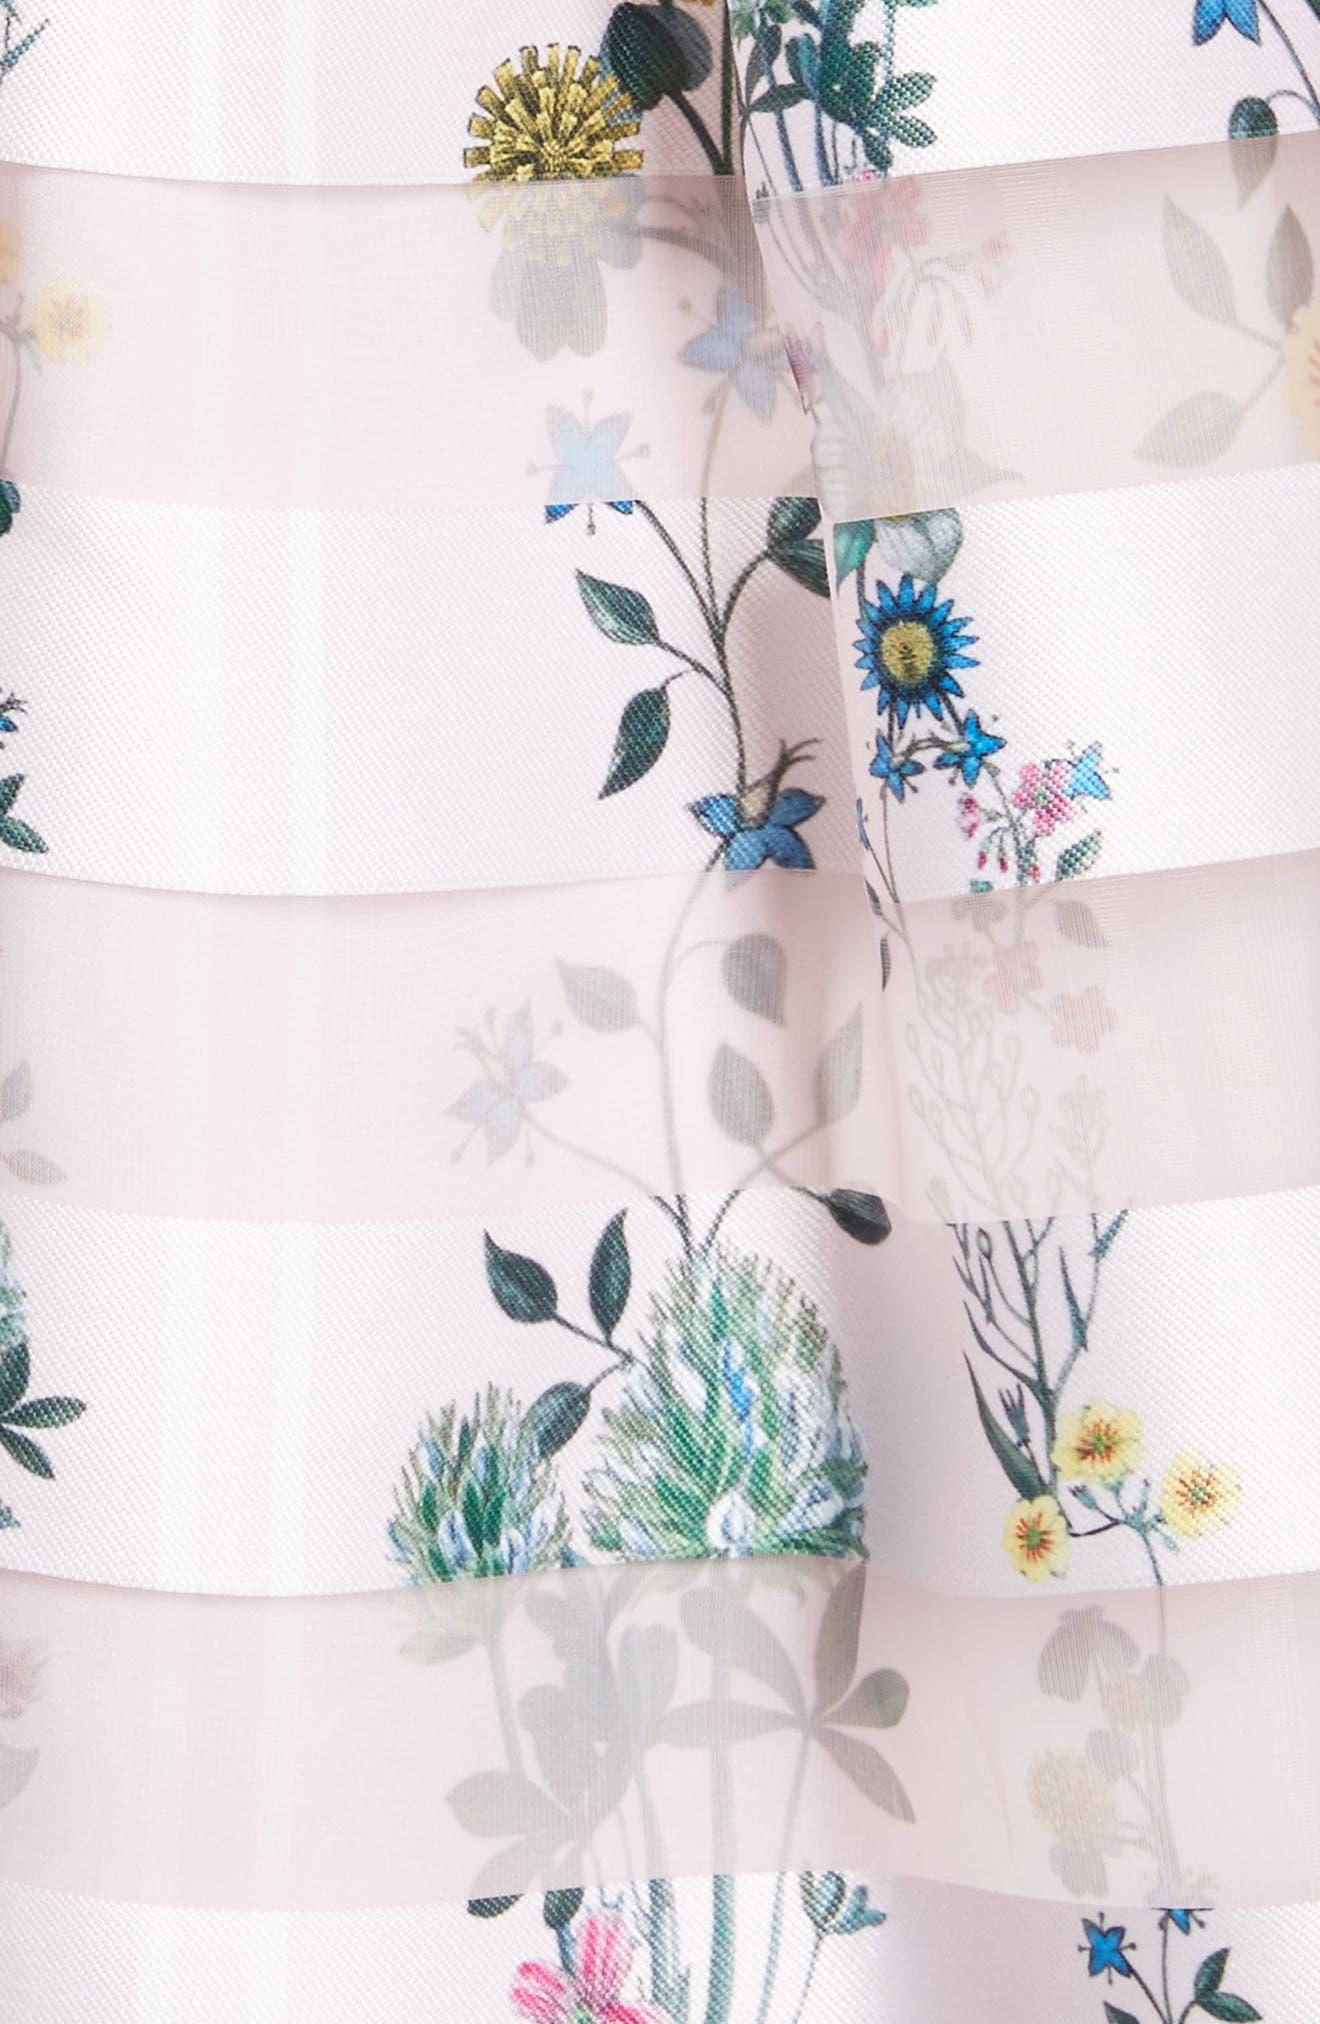 Lulou Unity Floral Off the Shoulder Dress,                             Alternate thumbnail 5, color,                             672